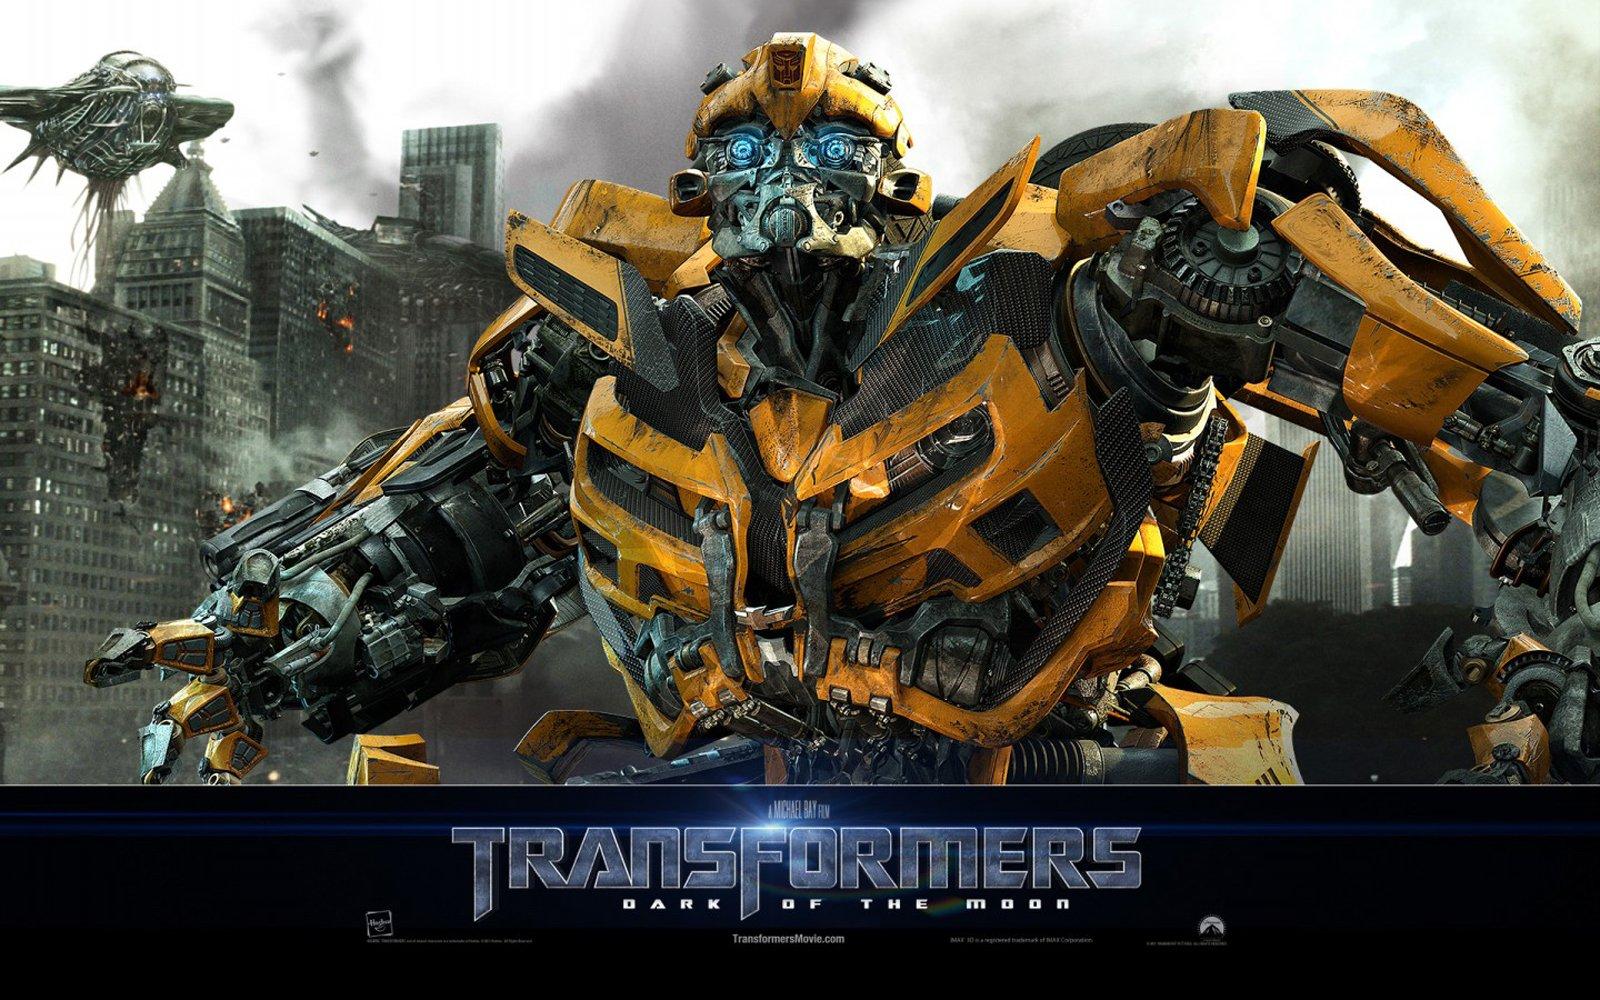 Bumblebee Transformers HD wallpaper